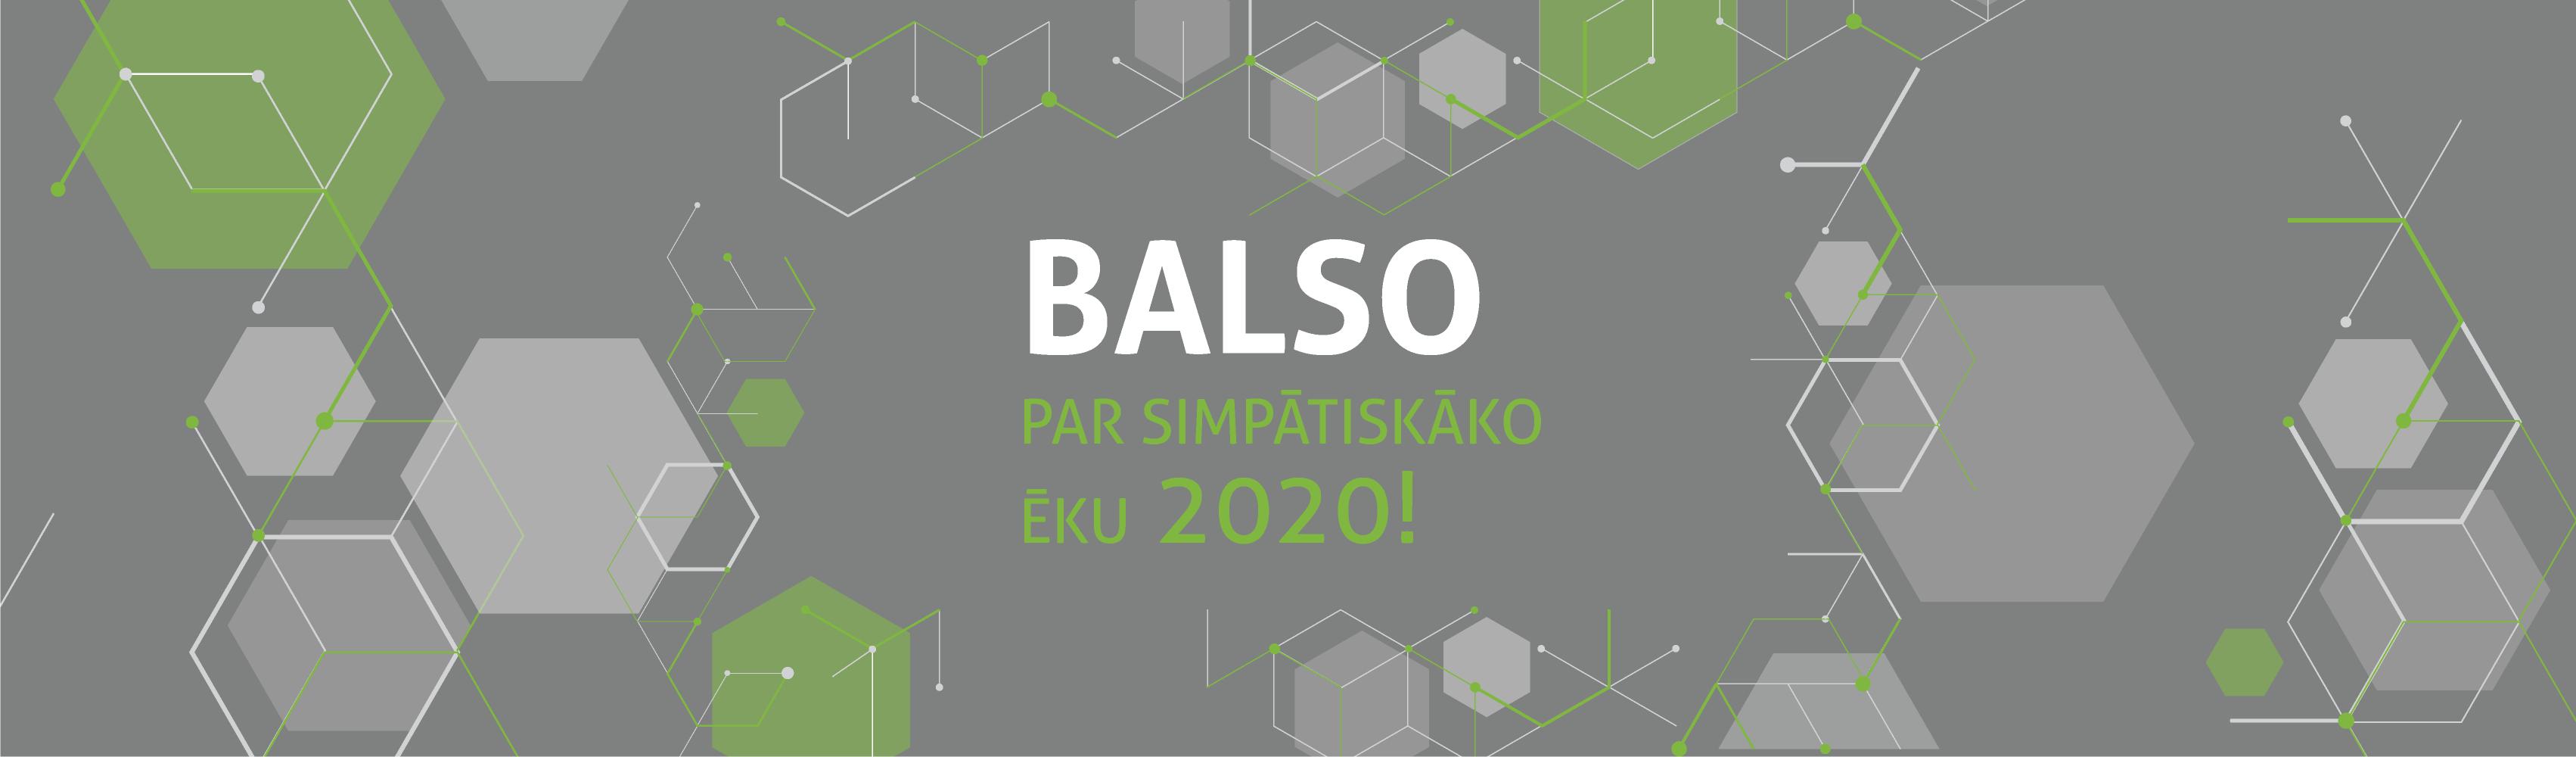 Balso_konkursam_majaspalai